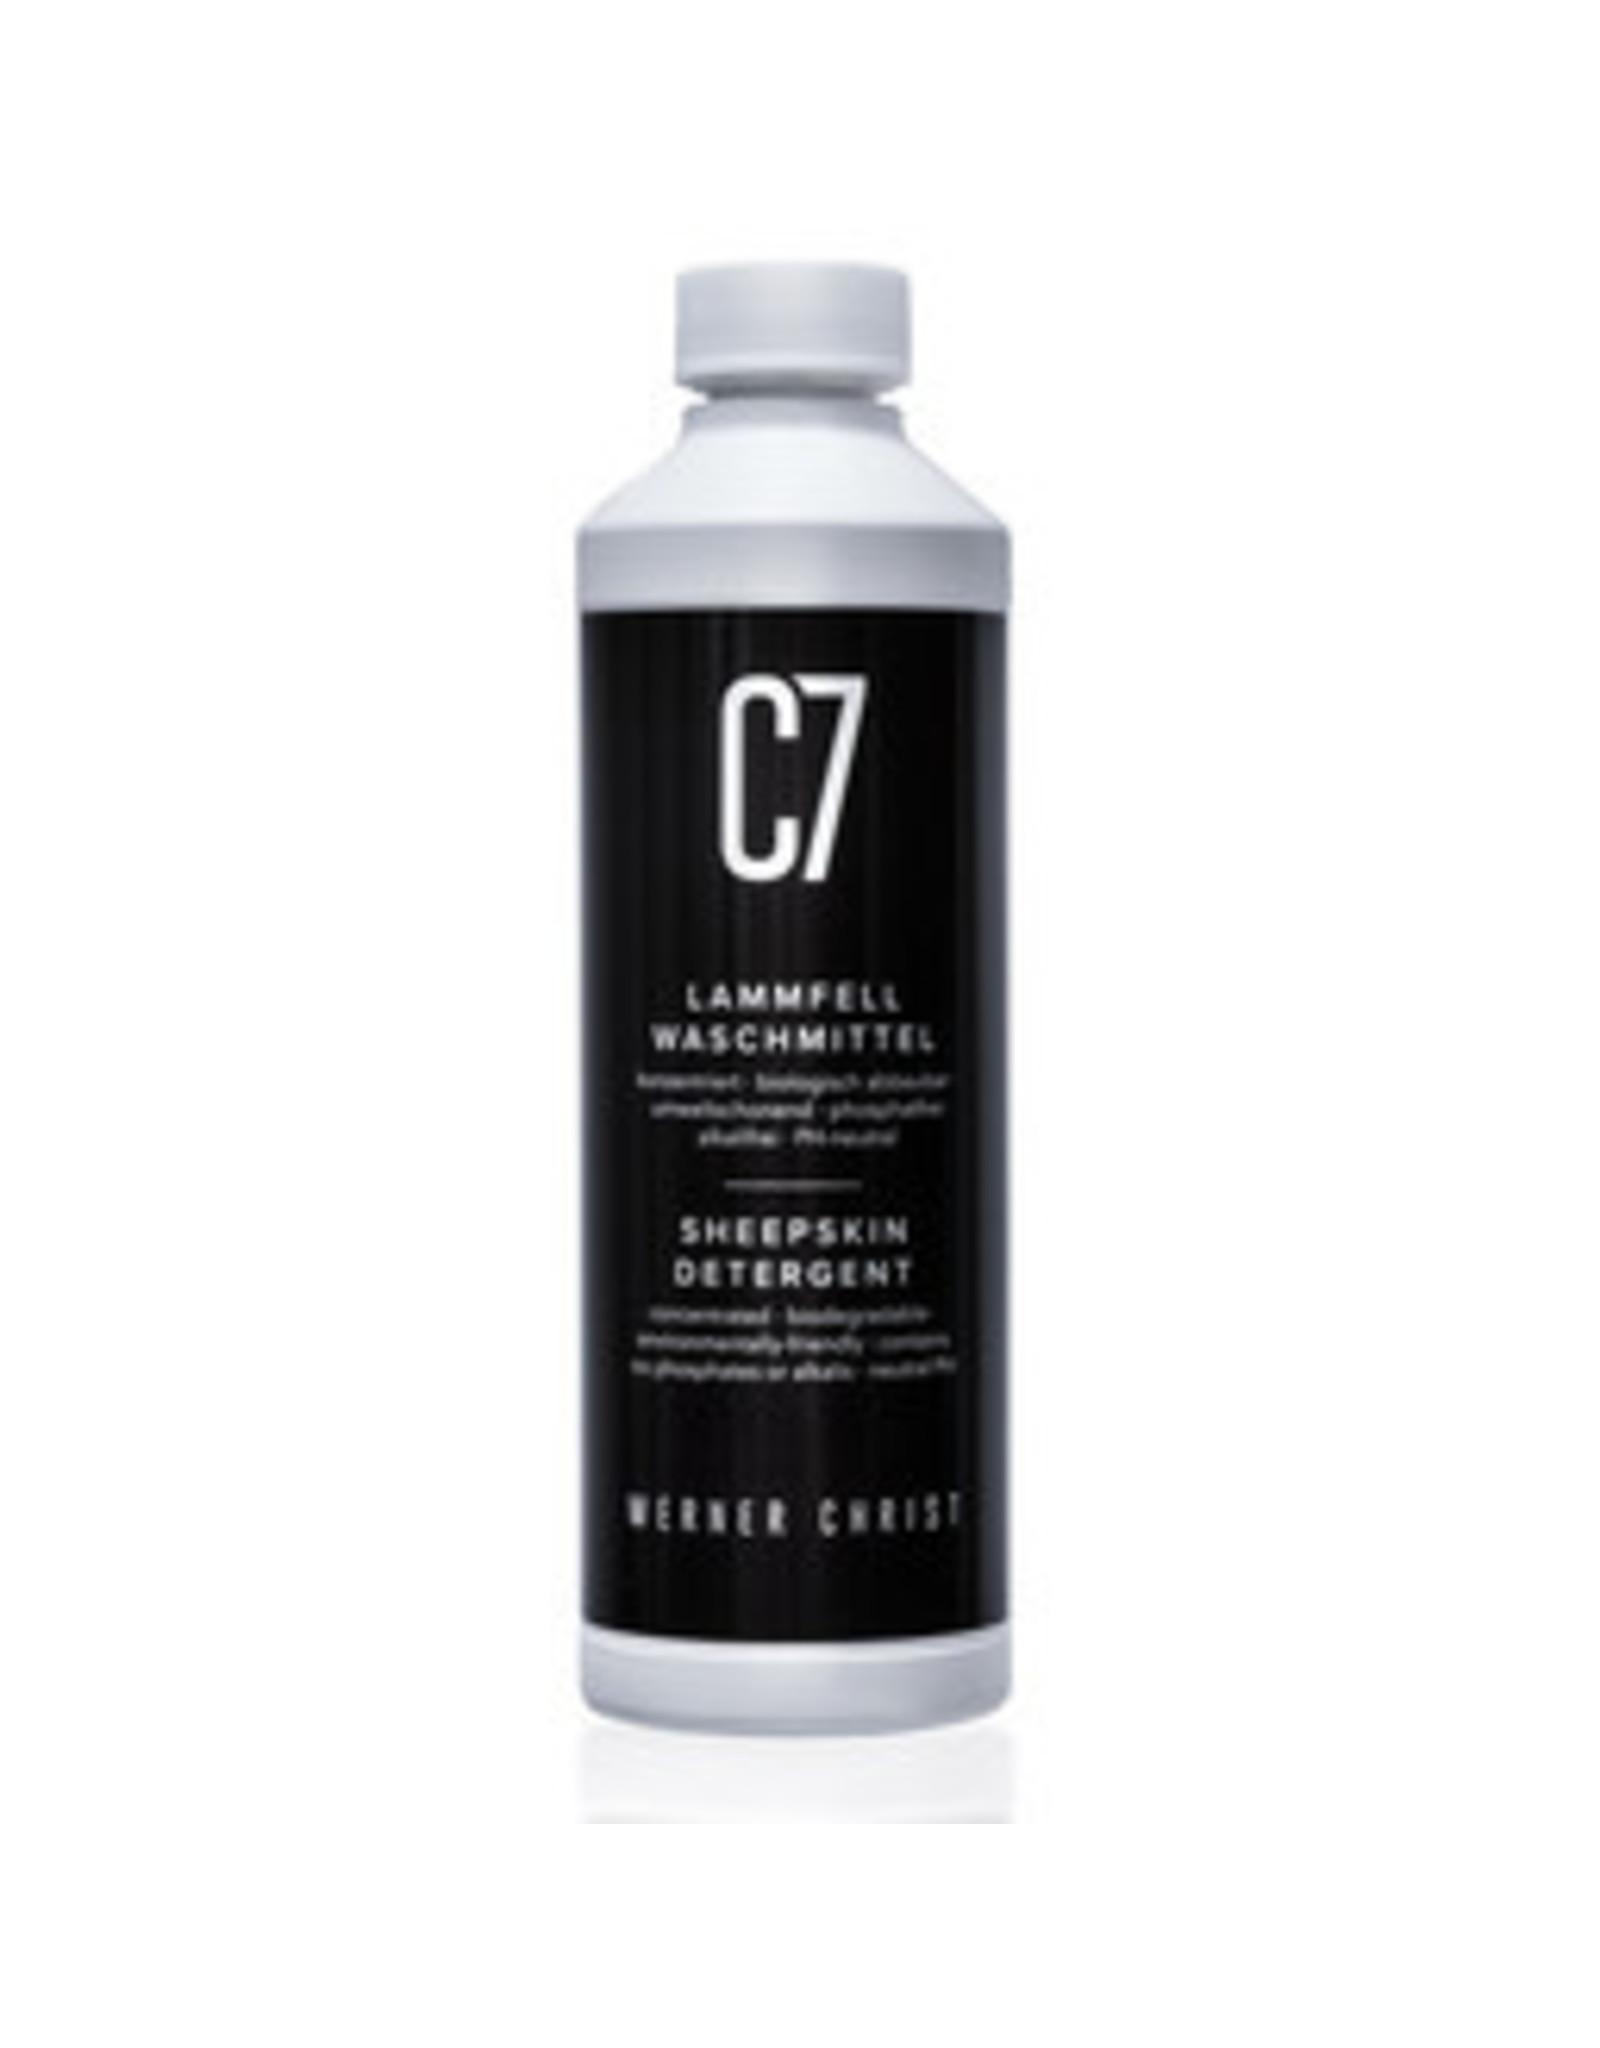 Christ Lamsvel wasmiddel C7